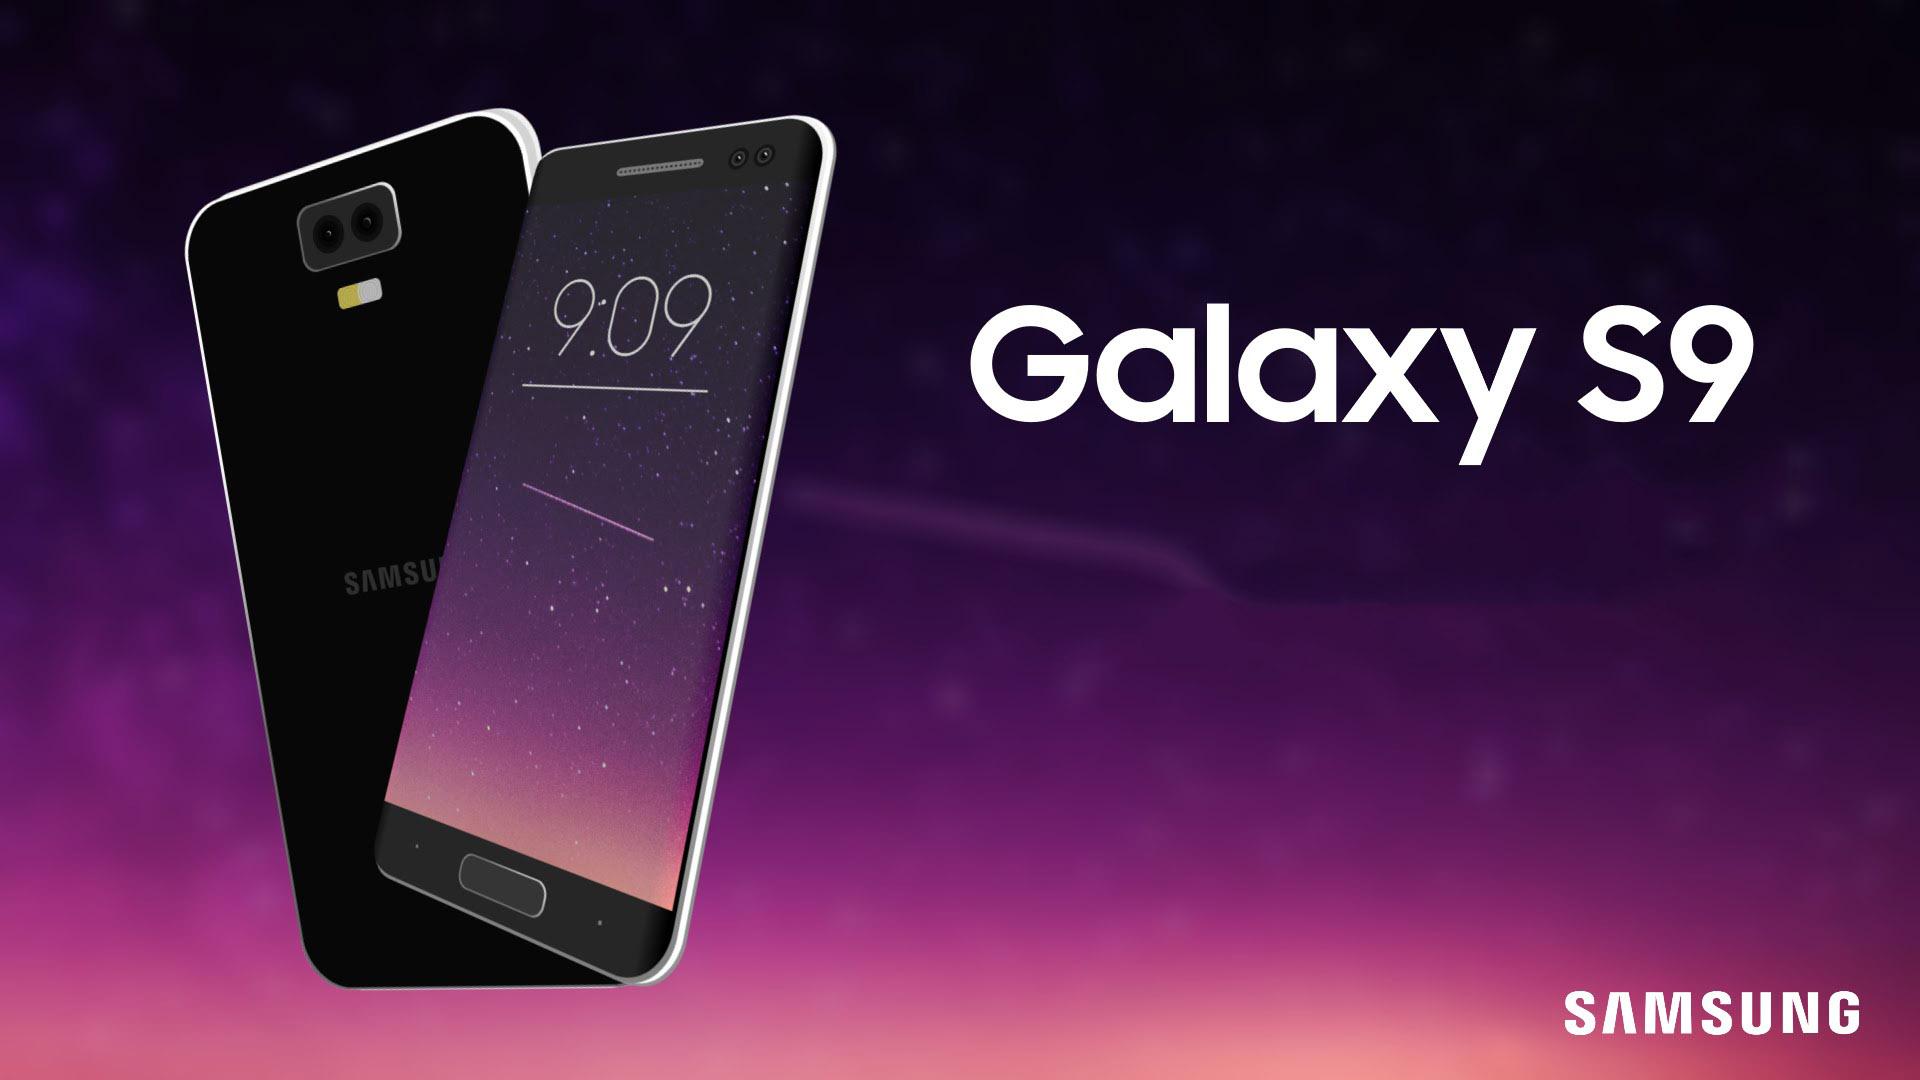 Samsung Galaxy S9/S9+ 全新的紫色太妩媚了!清新的蓝色也不赖!准备好换新手机了吗?